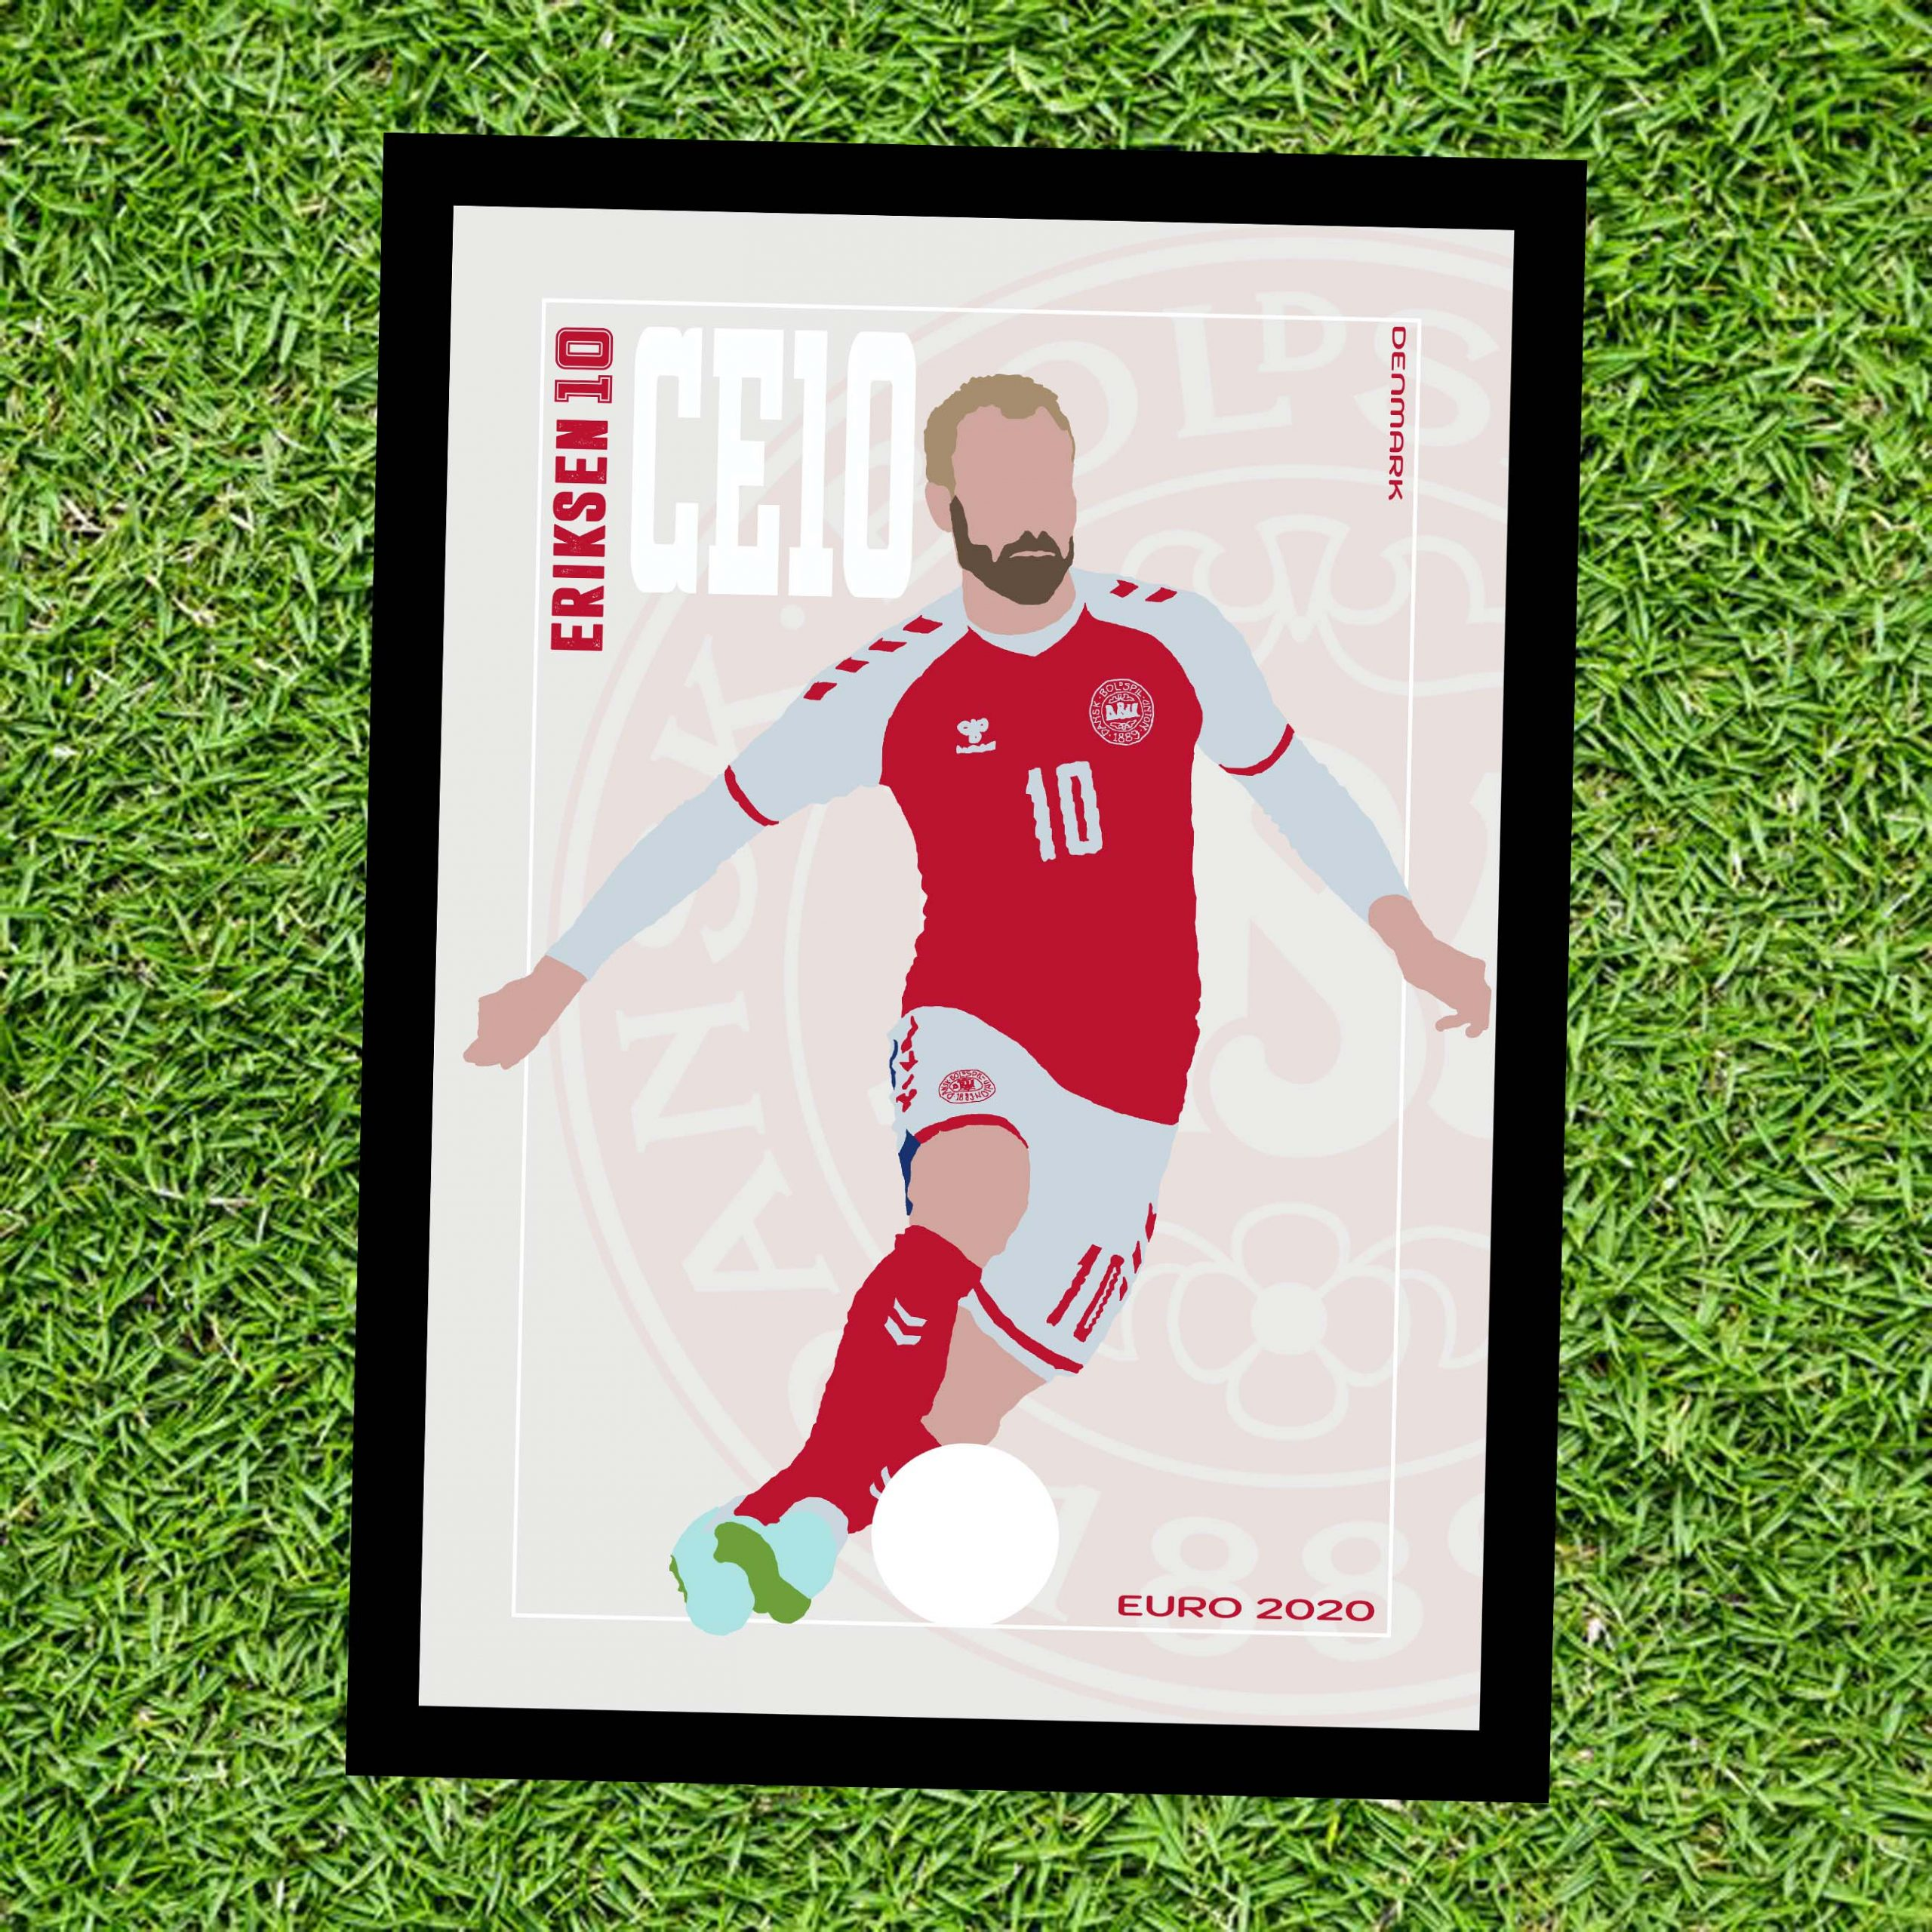 Cristian Eriksen - CE10 - Part of MaadWeb's Euro 2020 Series - Wall Art Print - On Grass - MaadWeb